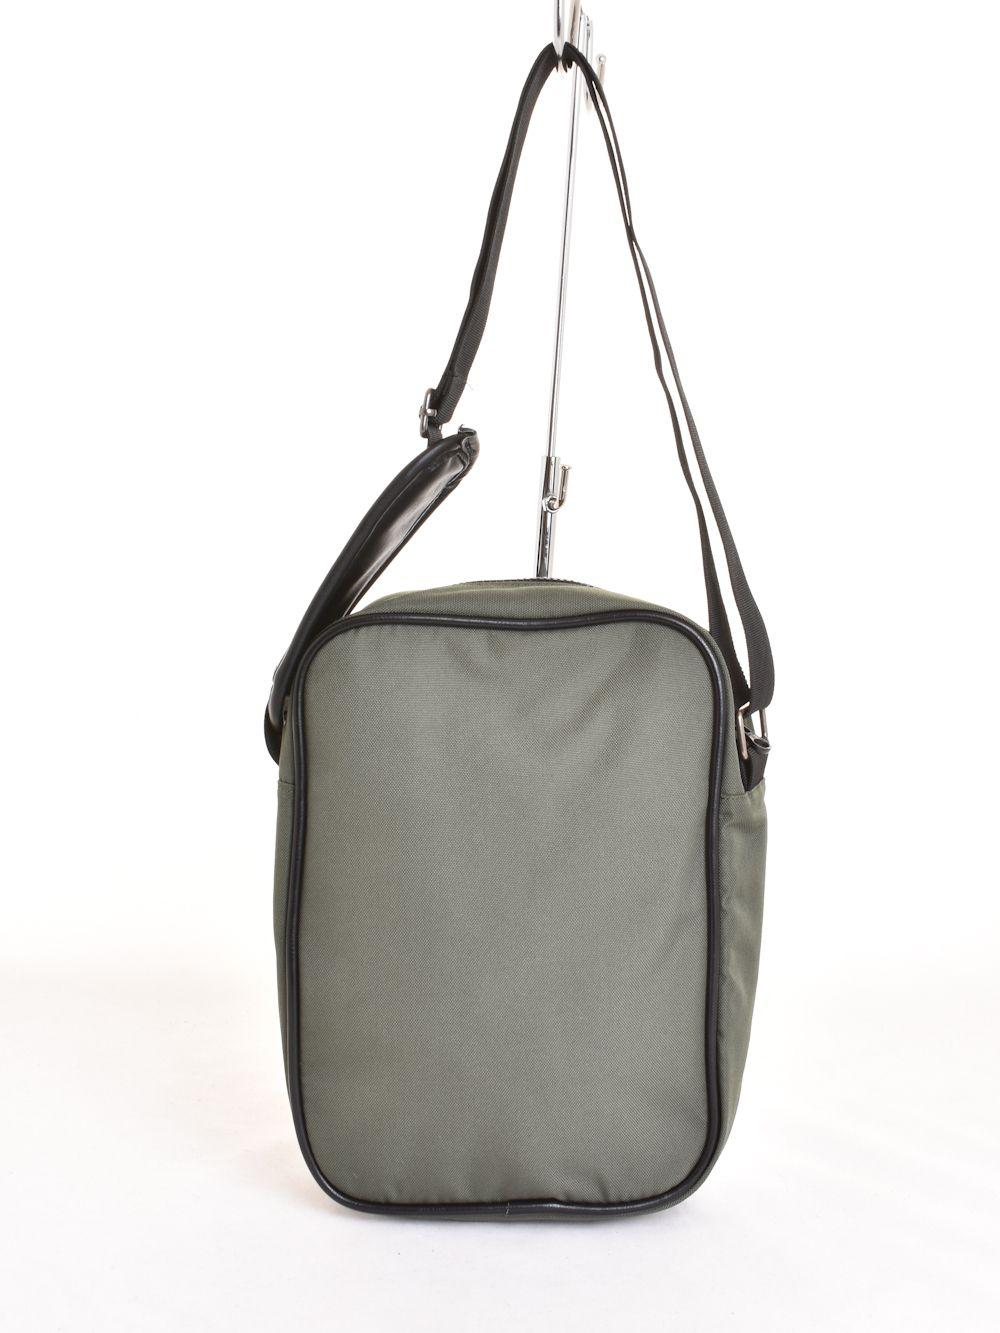 Devergo férfi táska · Devergo férfi táska · Devergo férfi táska ... 56e3d89ecd